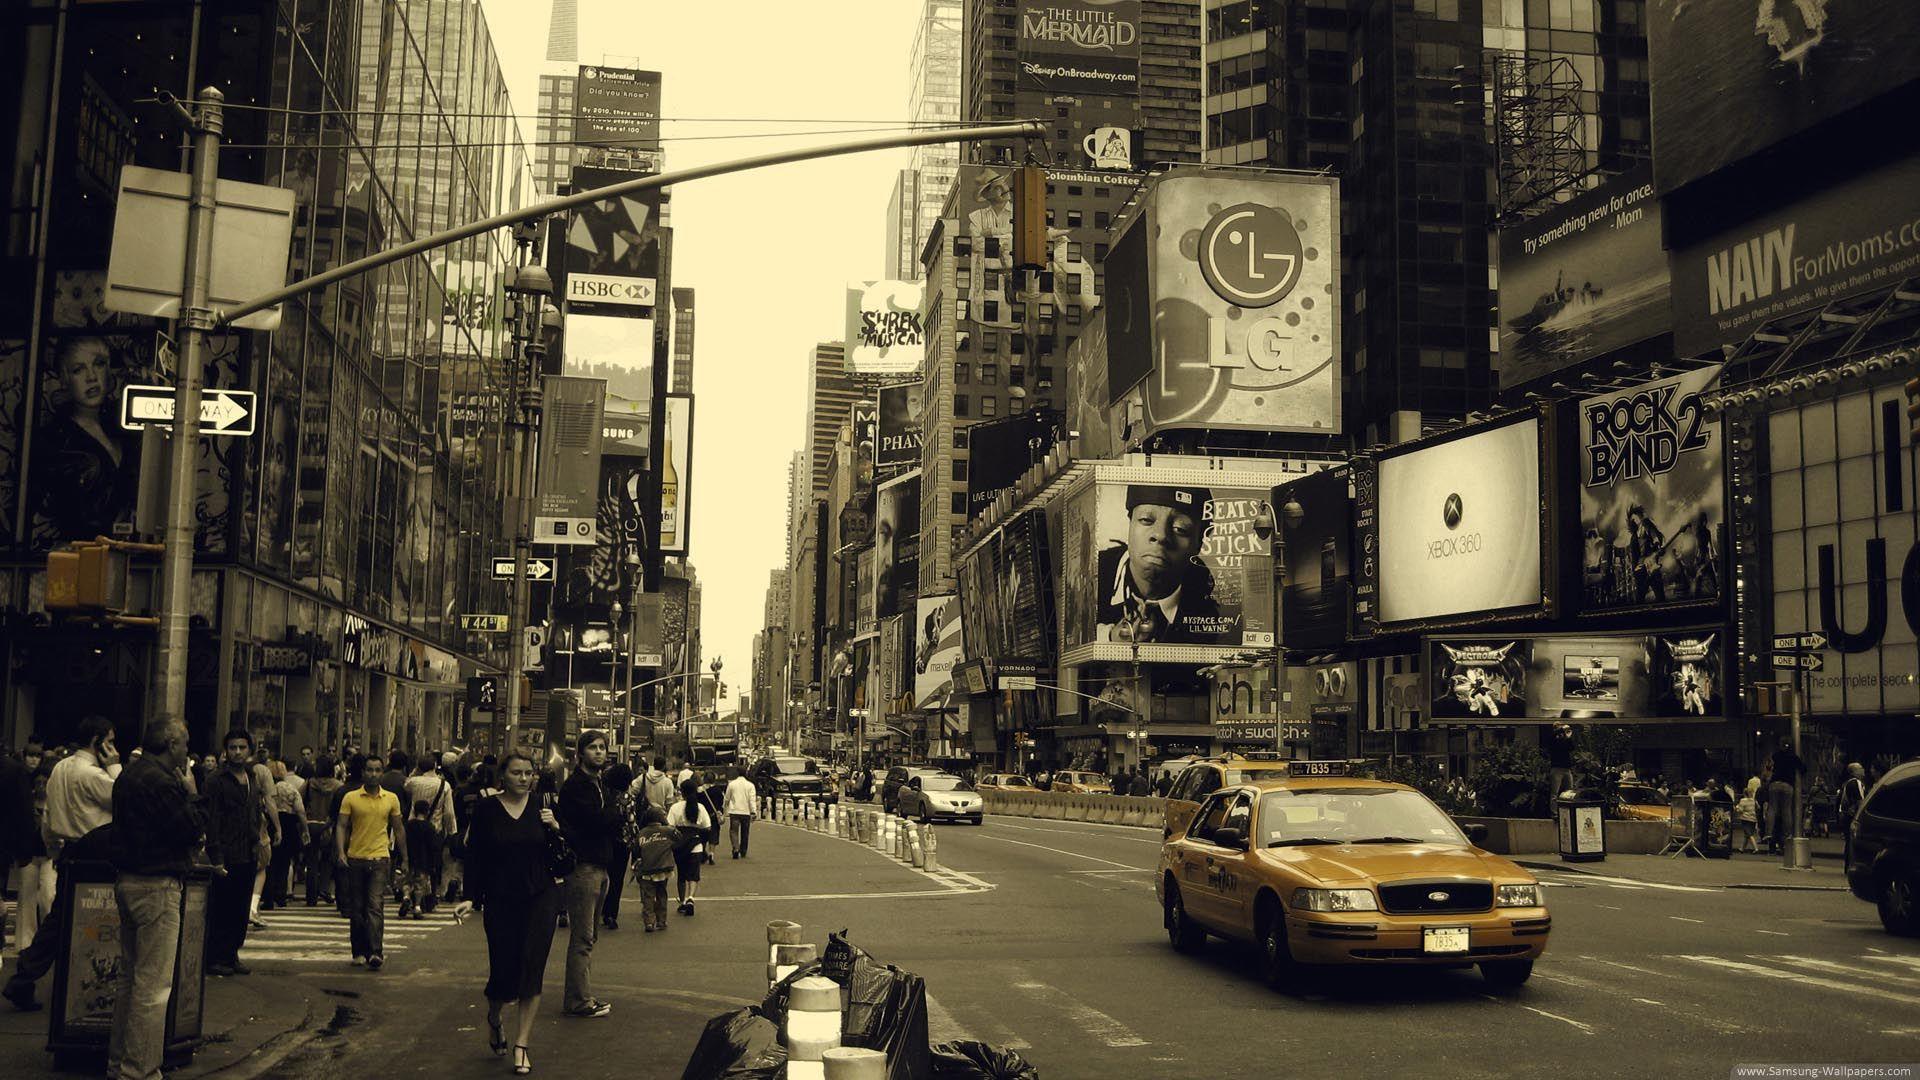 New York City Pictures New York City Pictures New York Pictures New York City Photos